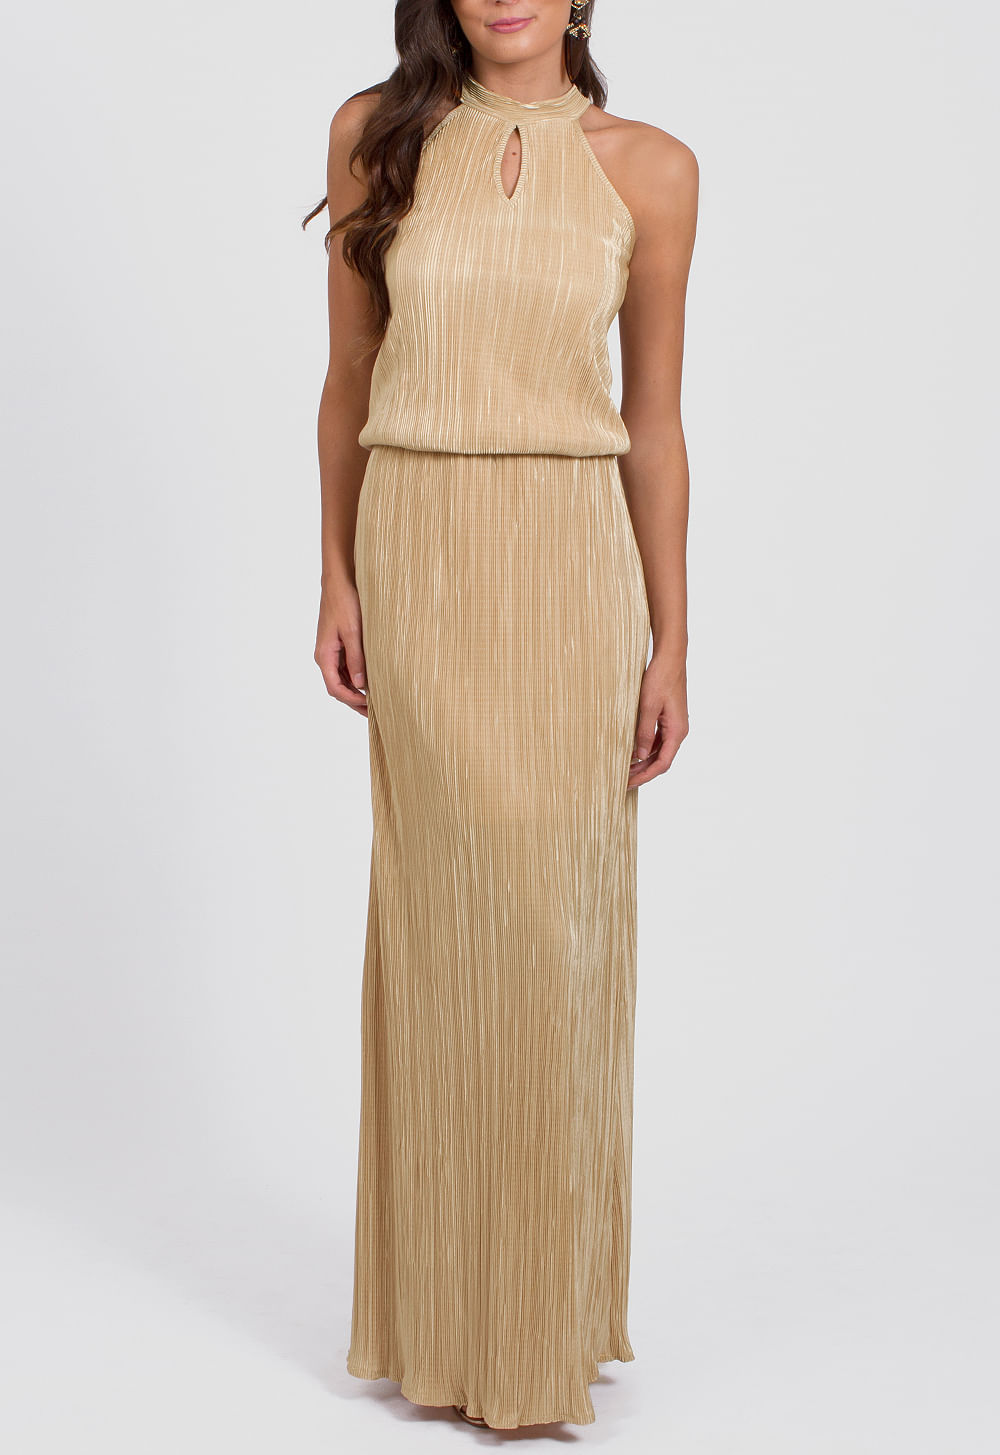 eb1dd1de8 vestido-tarsila-longo-todo-plissado-powerlook-dourado ...